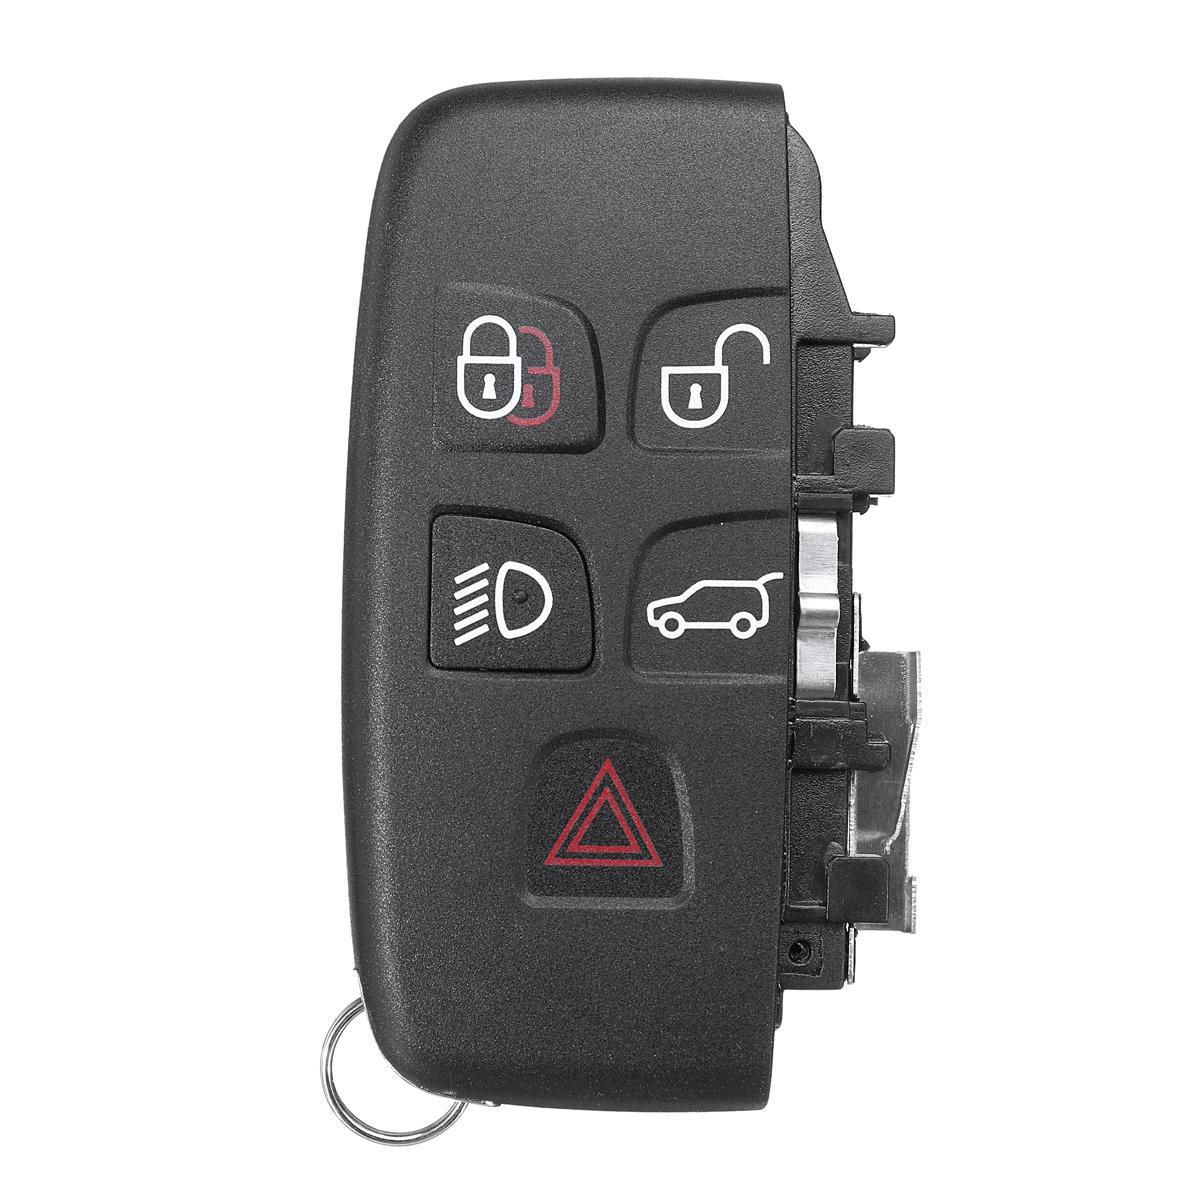 5 botones Control remoto llavero Caso Smart Key Shell para LAND ROVER LR4 Range Rover Sport Evoque